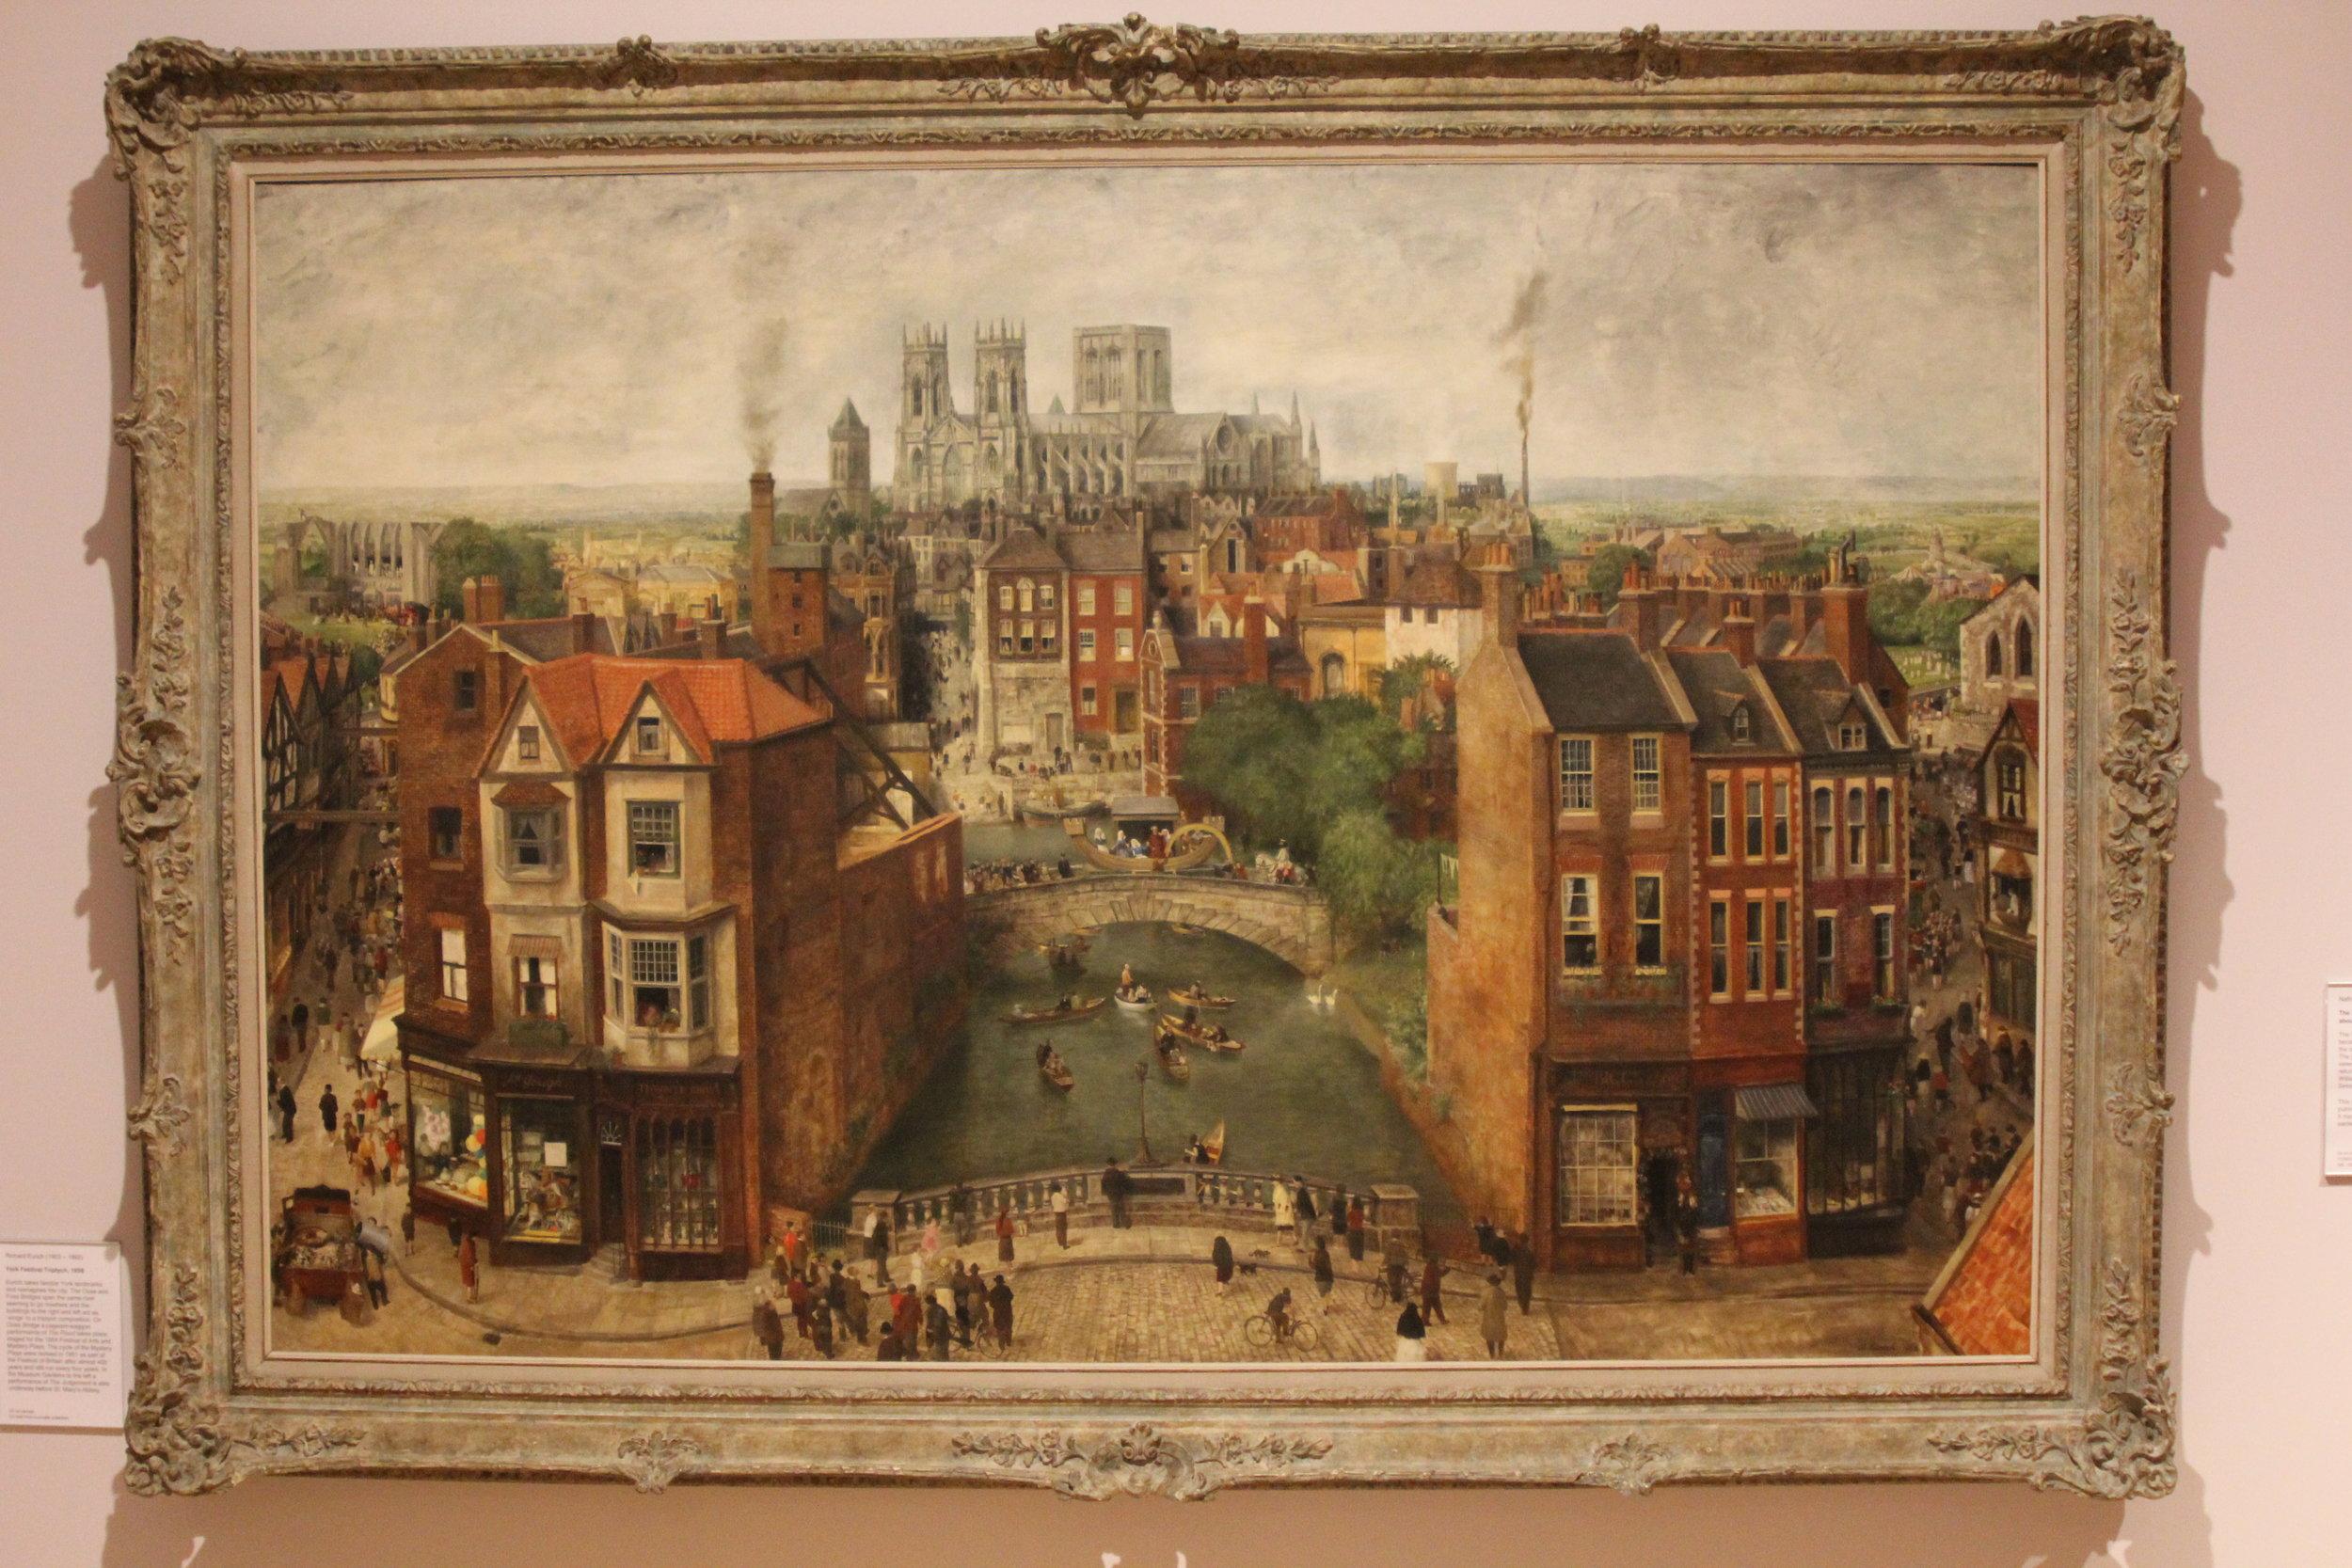 A painting of York's bridges